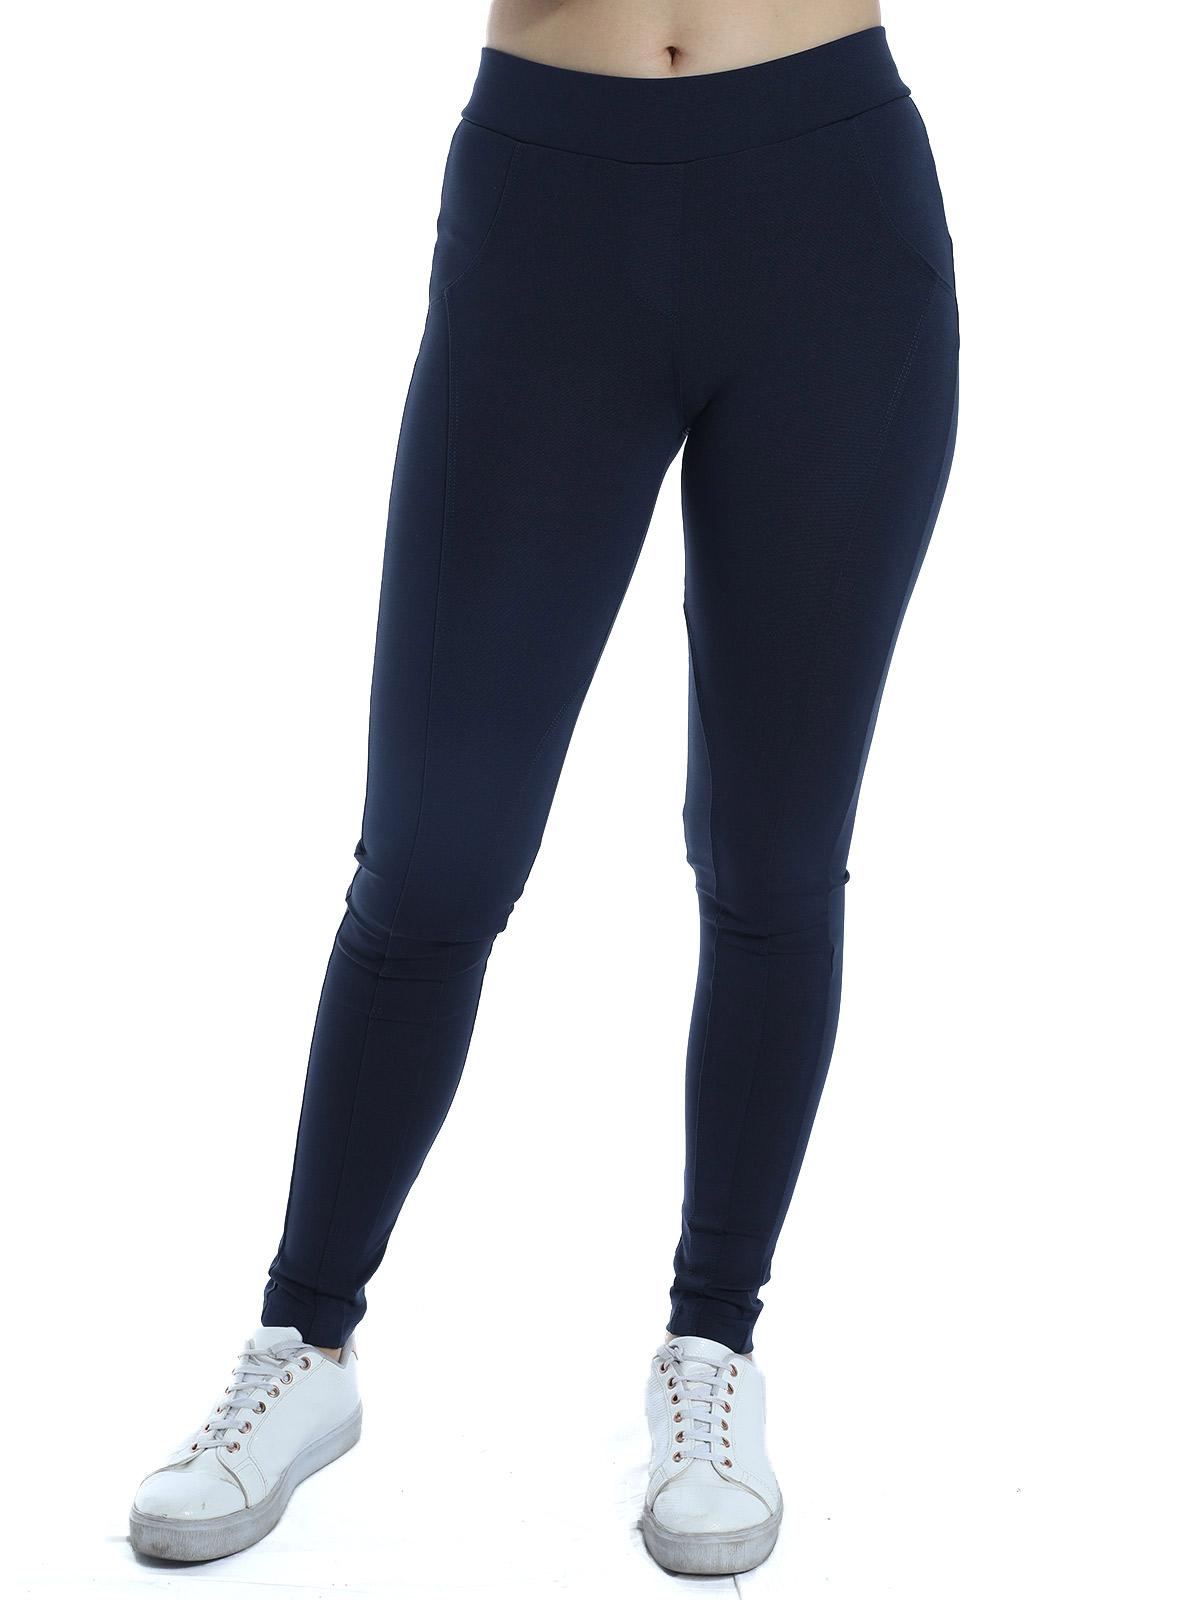 Calça Montaria Legging Feminina Fitness Body Fit Preta